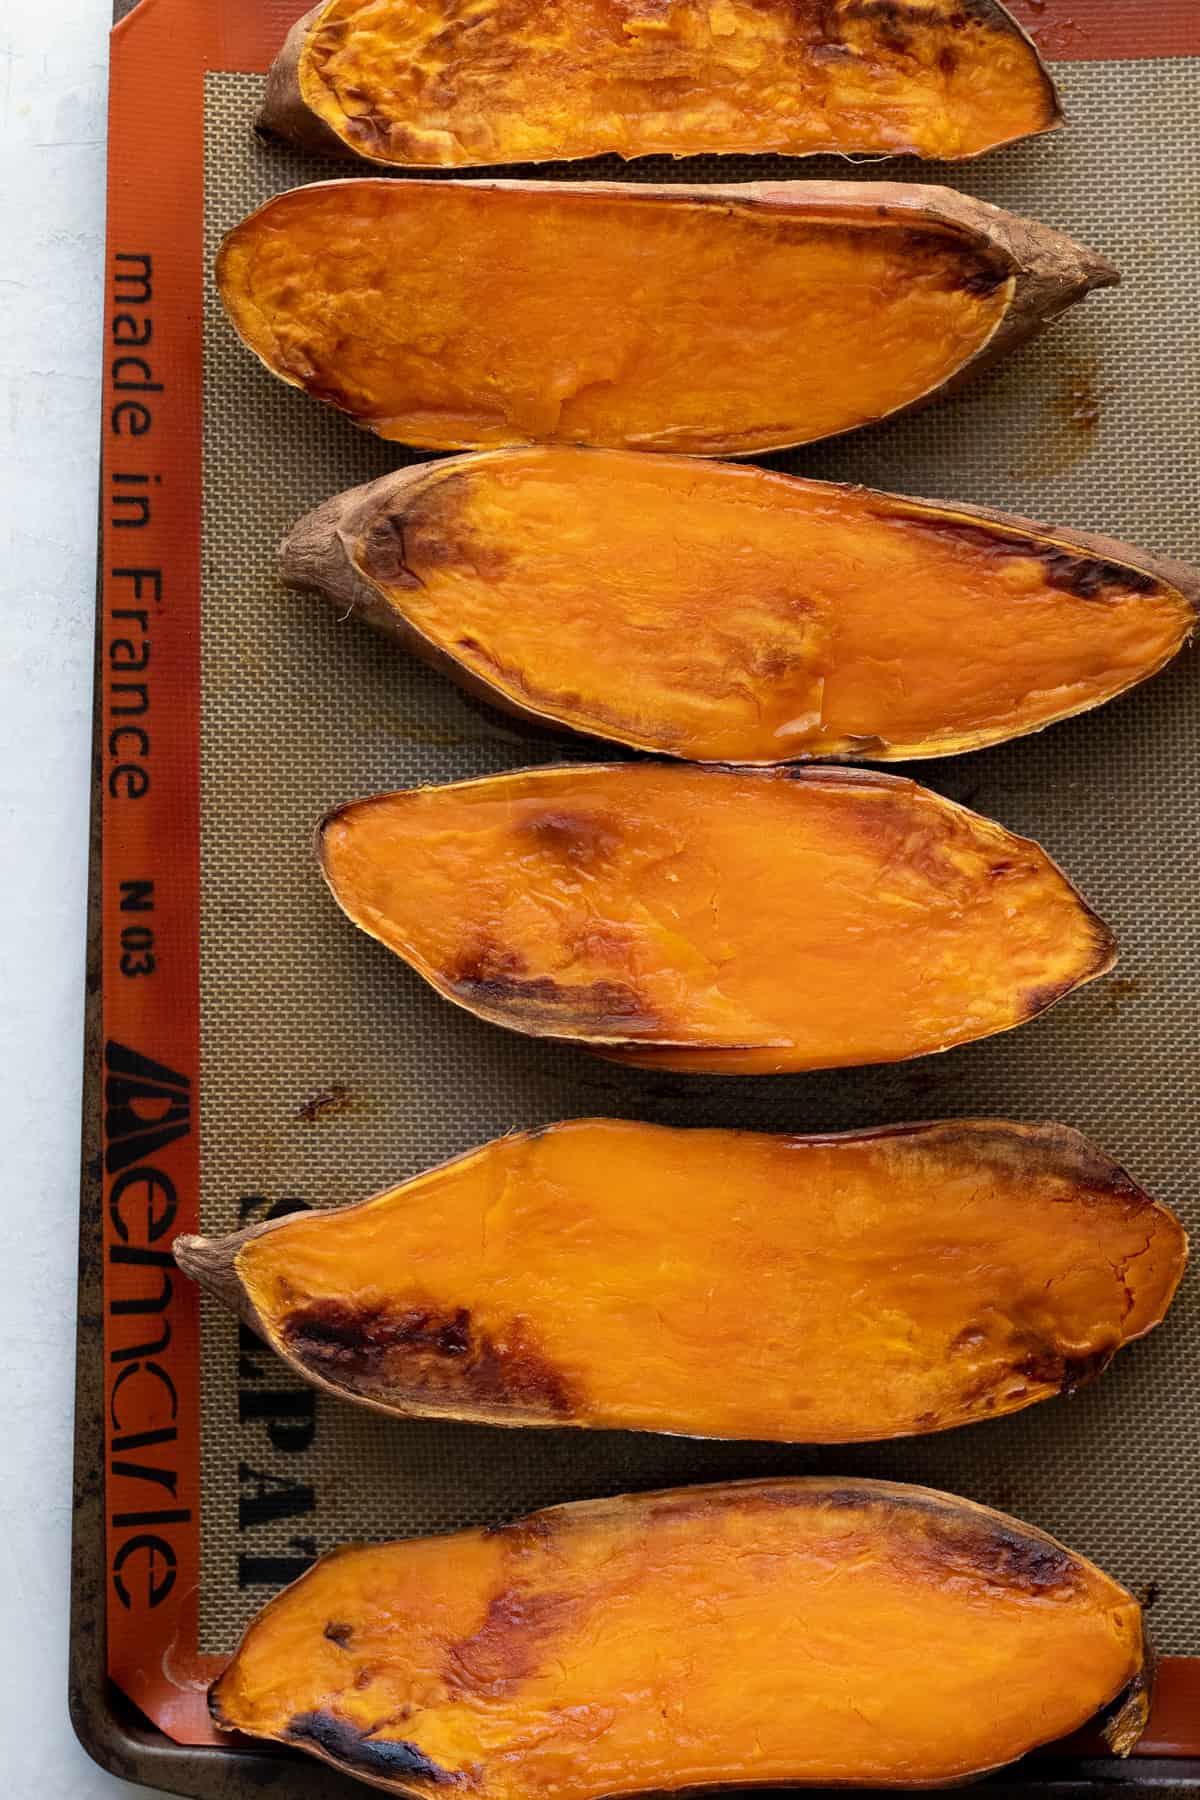 halved sweet potatoes on baking sheet after roasting